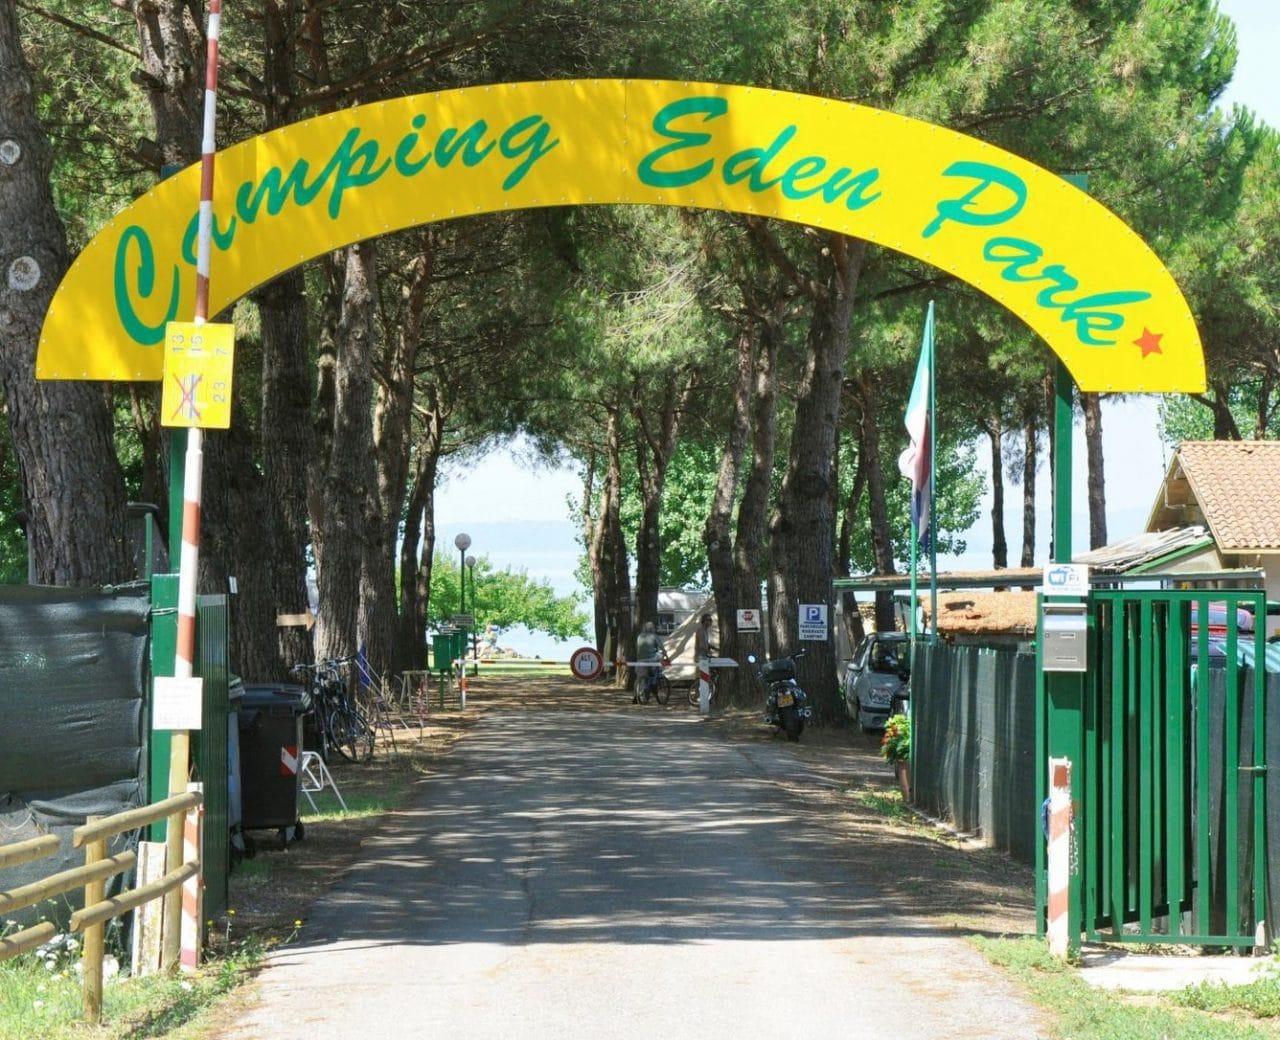 Camping Eden Park di Magione (PG)